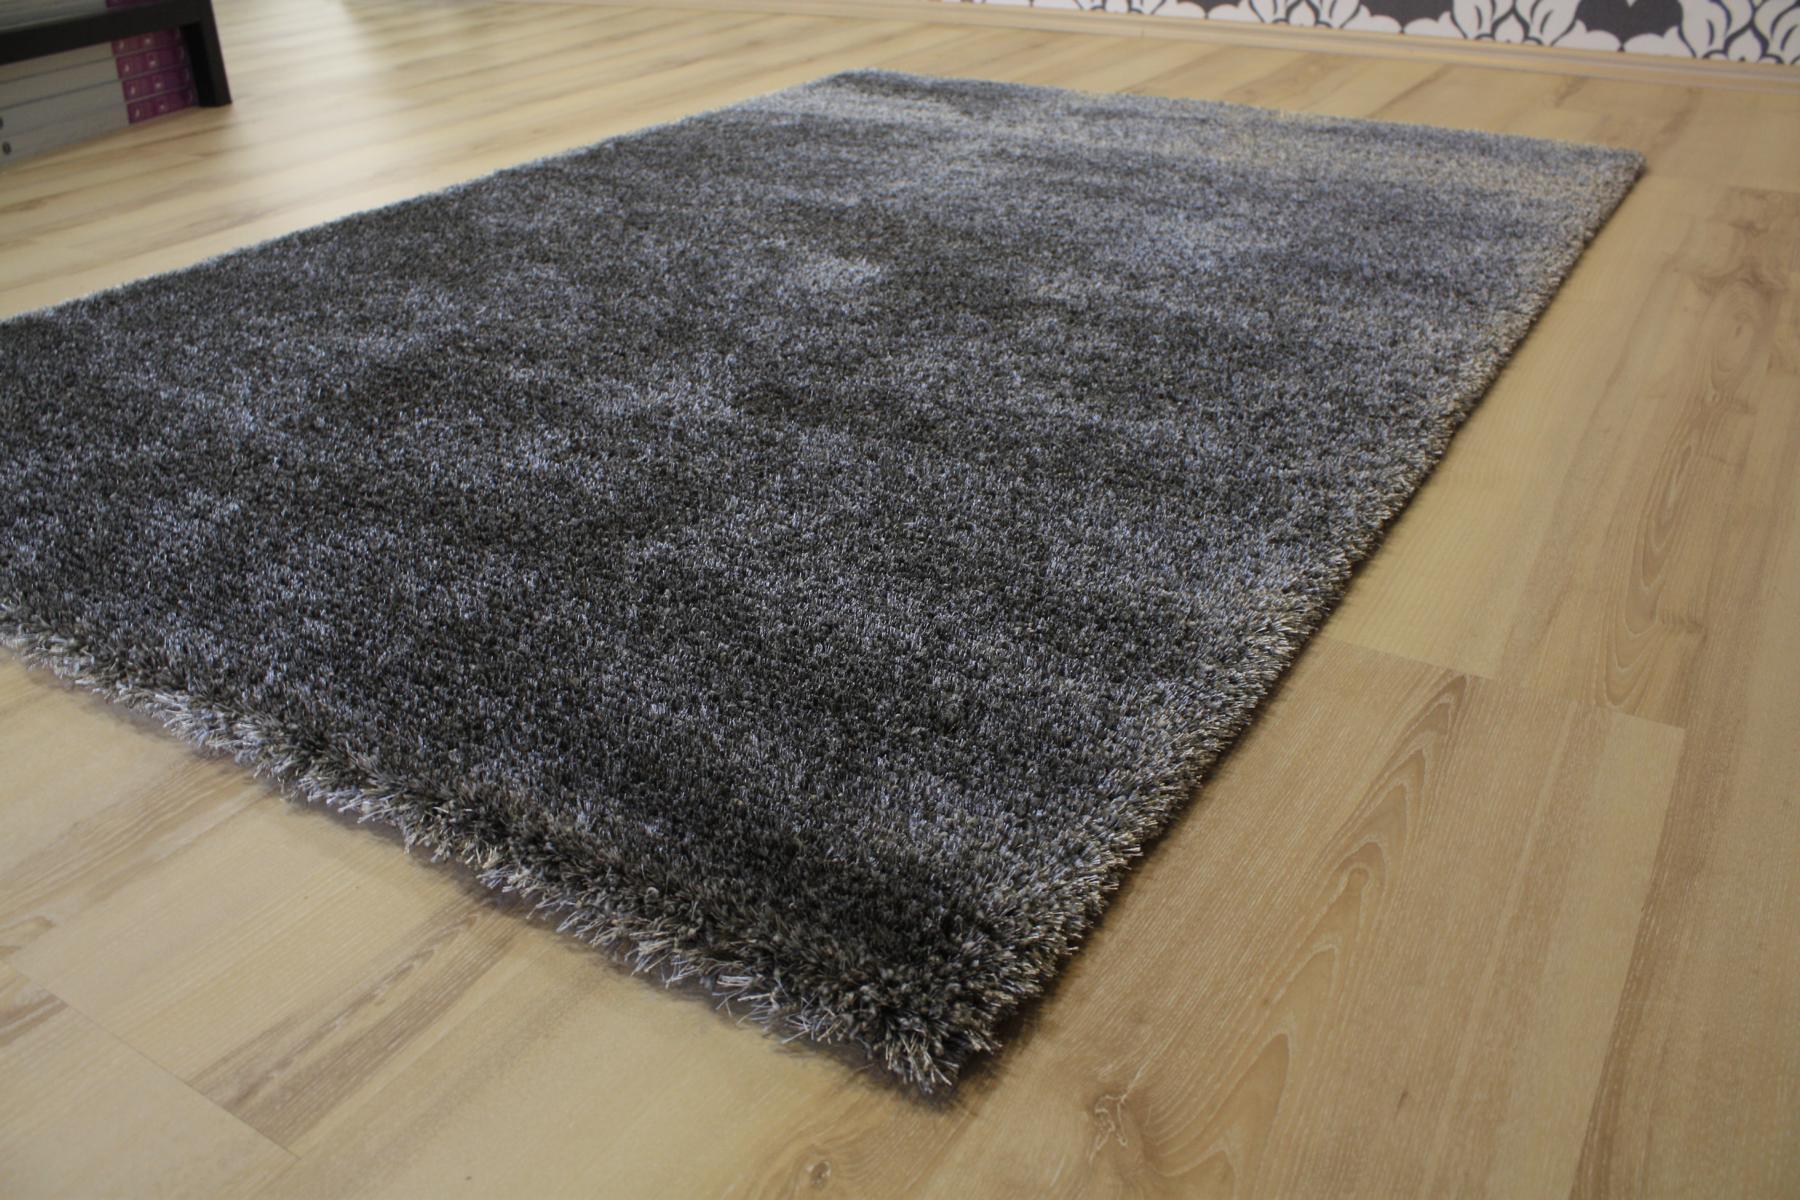 tapis spectrum ragolle 80001 uni 4383 gris argent 67x140. Black Bedroom Furniture Sets. Home Design Ideas